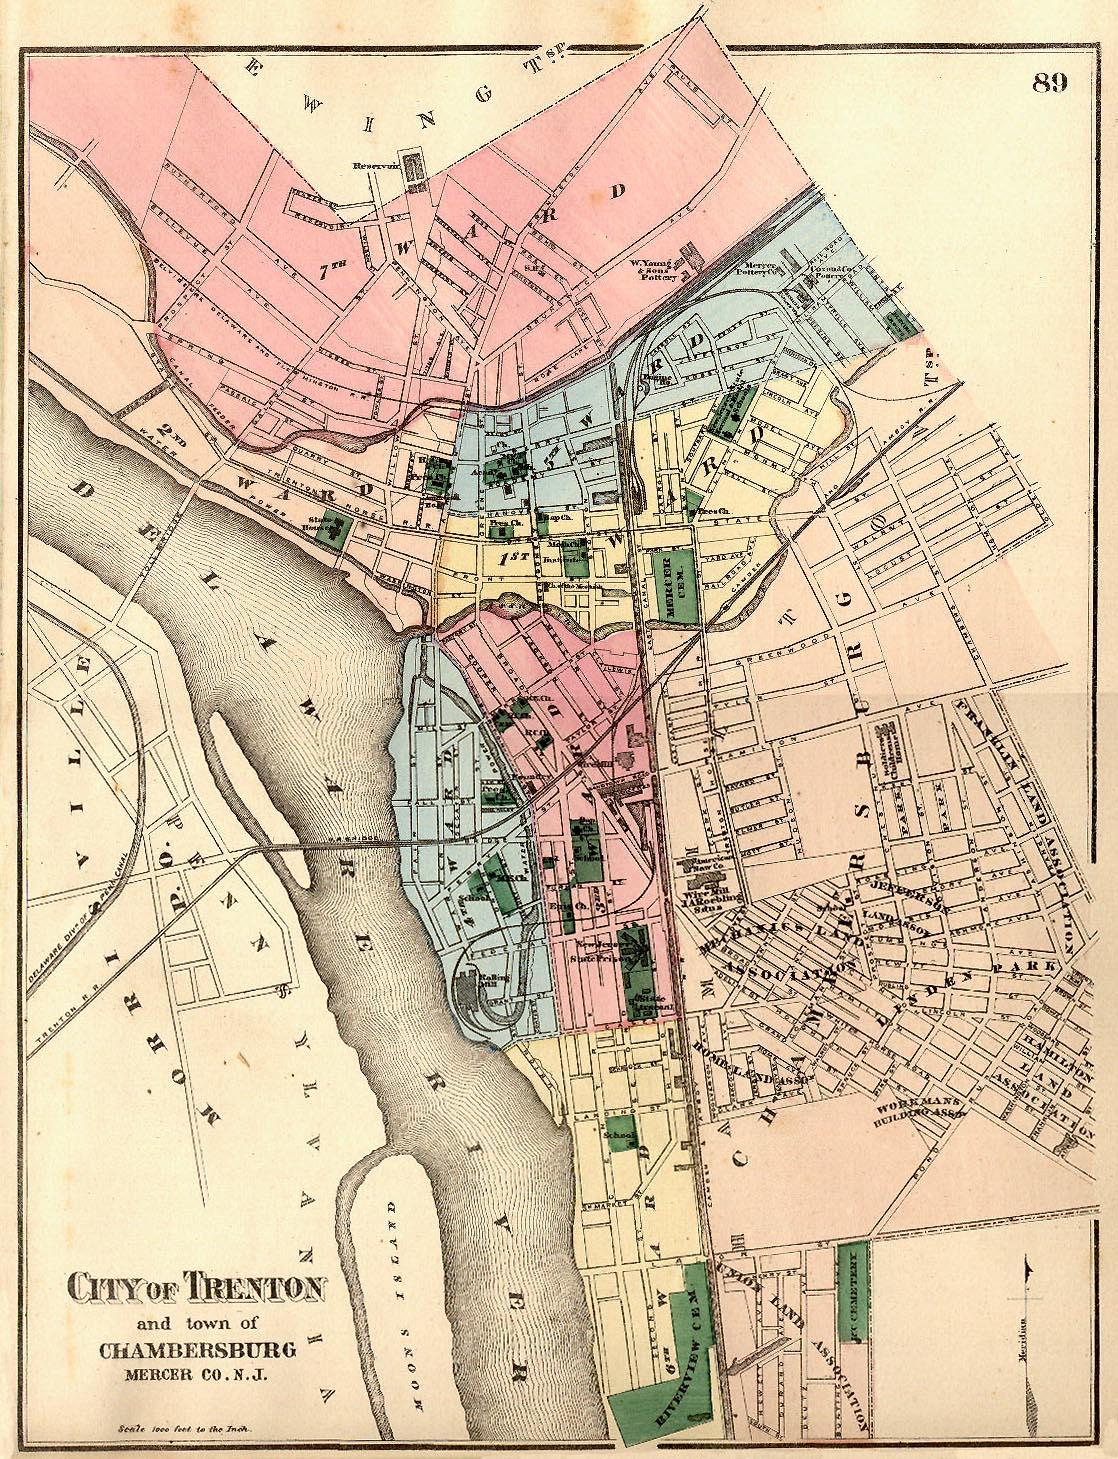 More Genealogy & Heritage Links | Mercer County, NJ